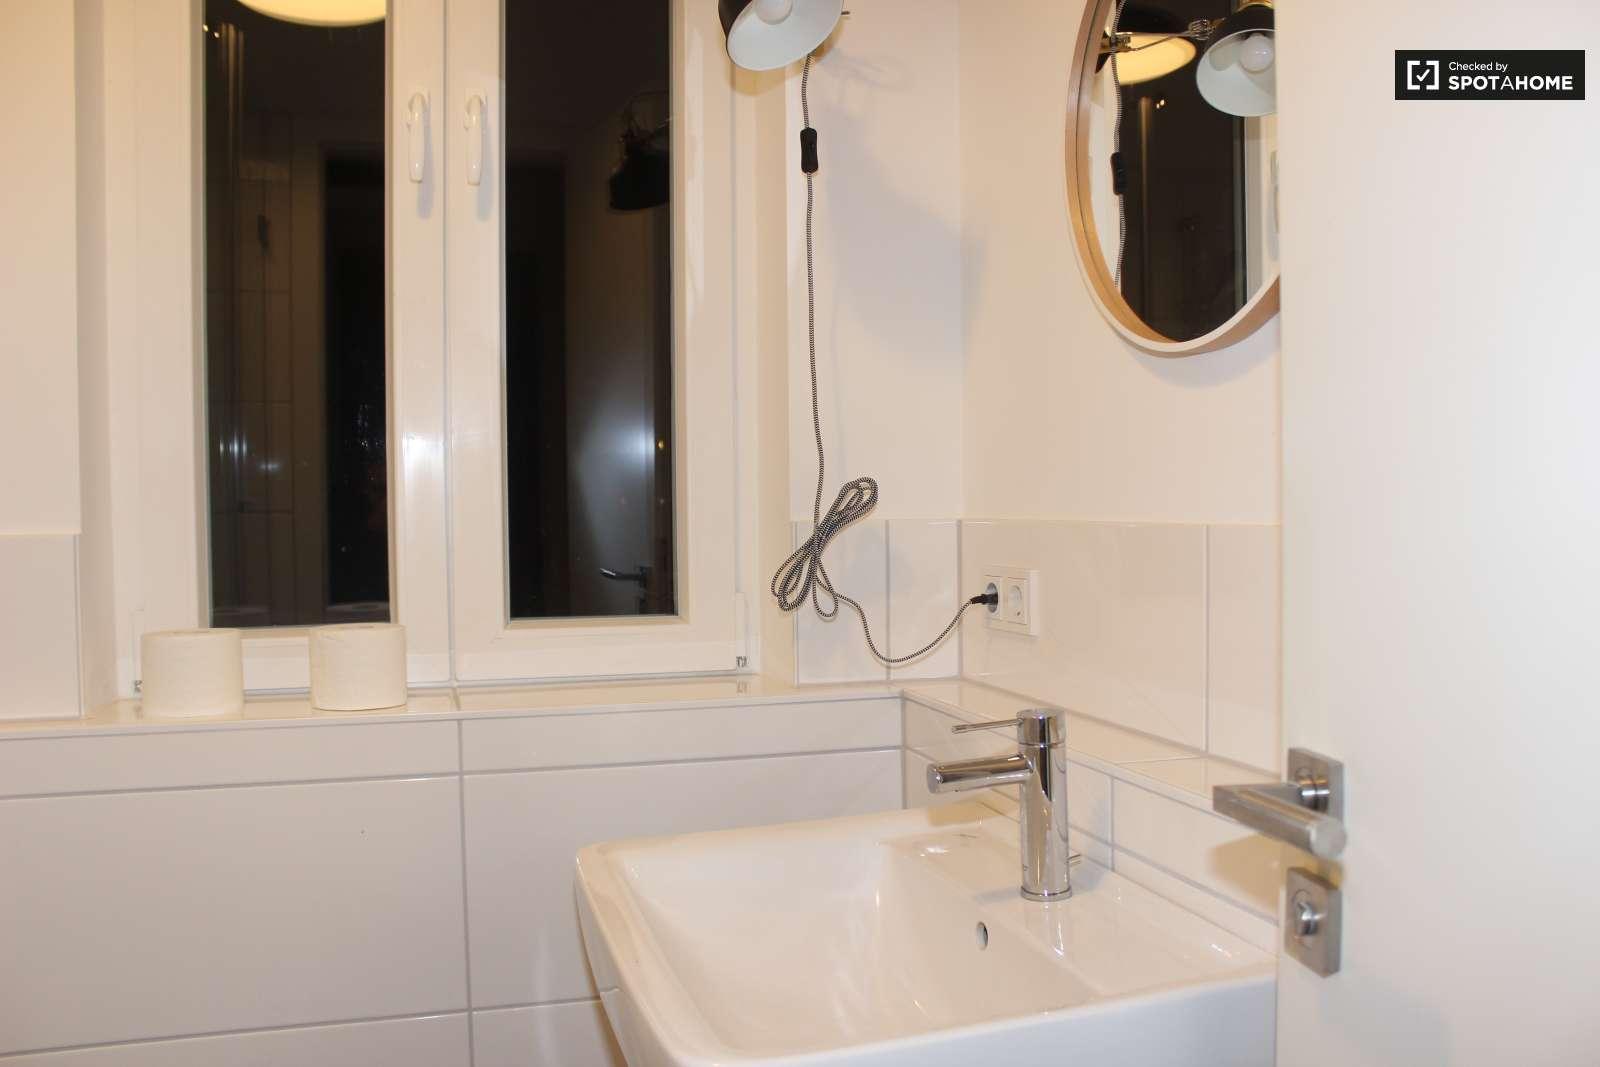 helles wg zimmer in wohnung in friedrichshain kreuzberg berlin ref 119281 spotahome. Black Bedroom Furniture Sets. Home Design Ideas